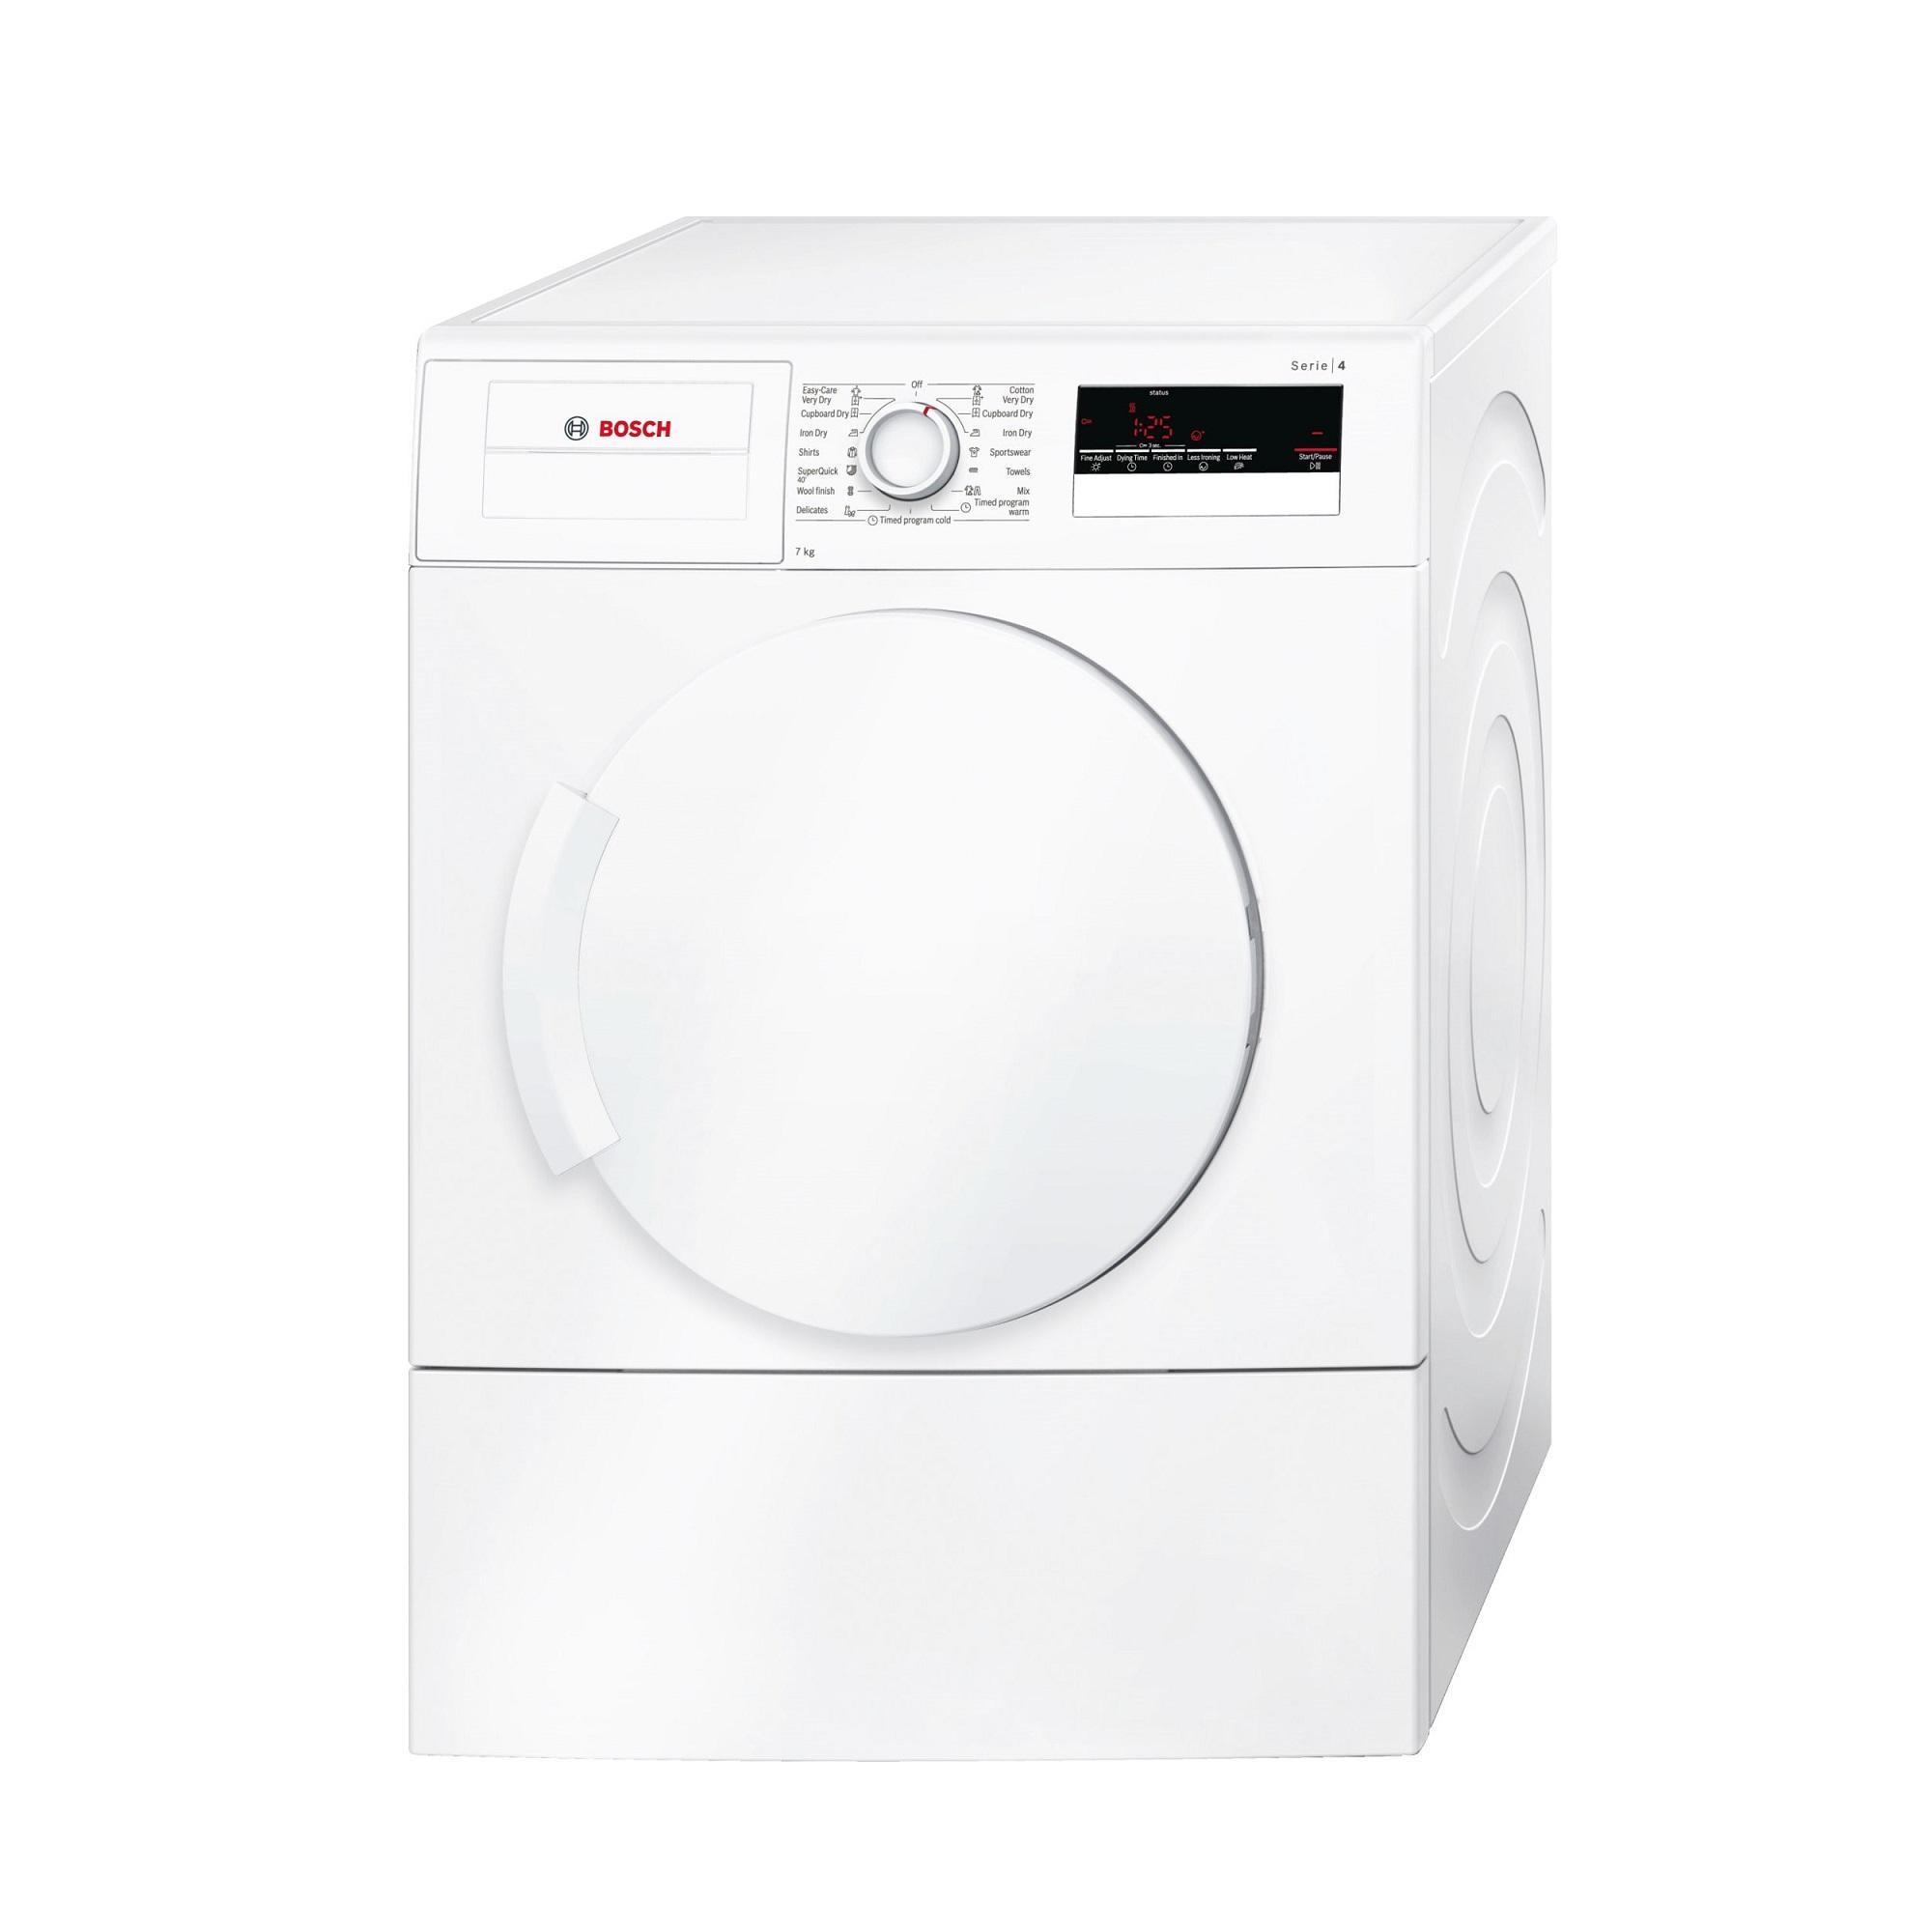 Bosch Washers & Dryers Singapore